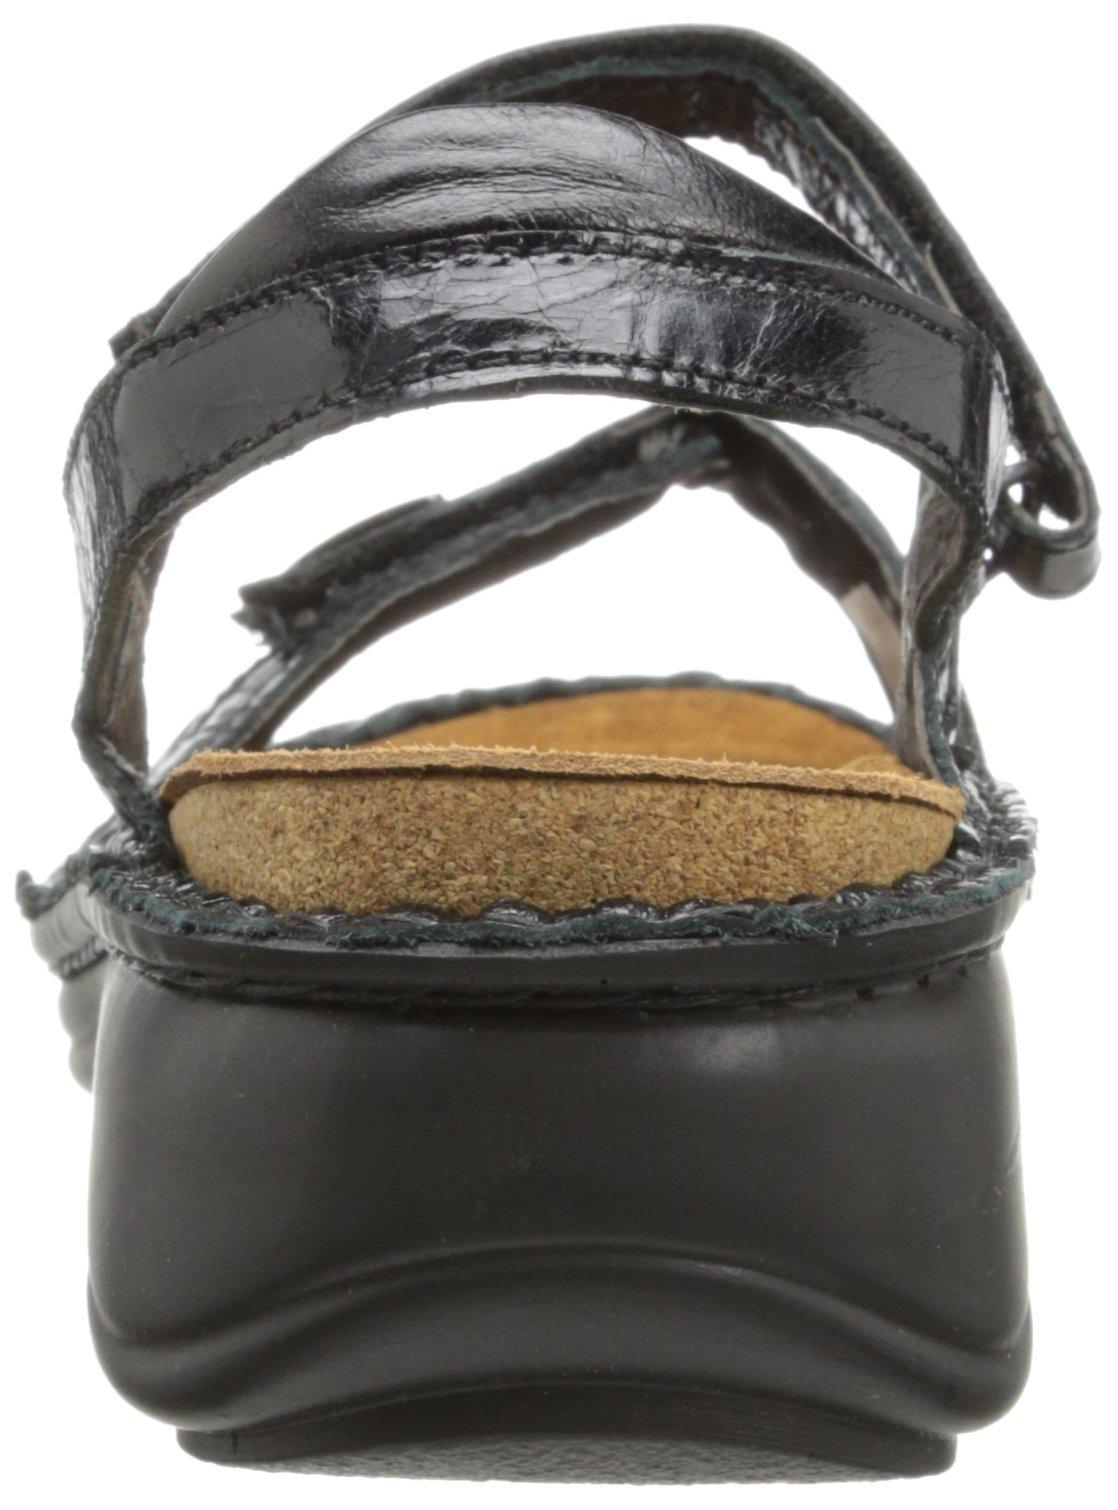 Naot Women's Papaya Flat,Black Madras Leather,40 EU/8.5-9 M US by NAOT (Image #2)